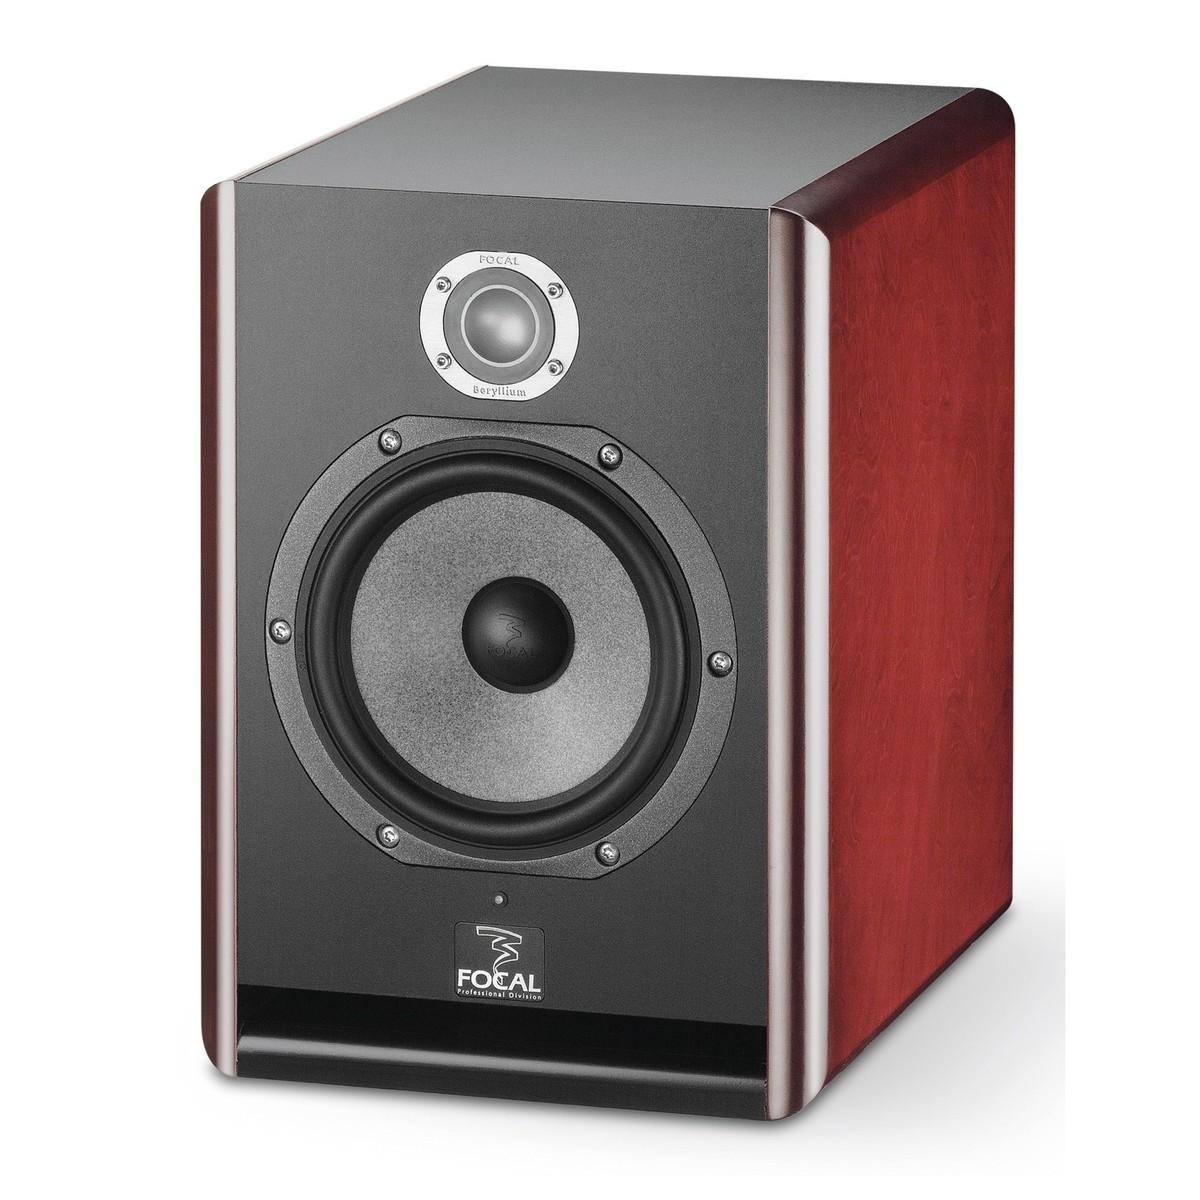 focal solo 6 be active studio monitor speaker single at gear4music. Black Bedroom Furniture Sets. Home Design Ideas